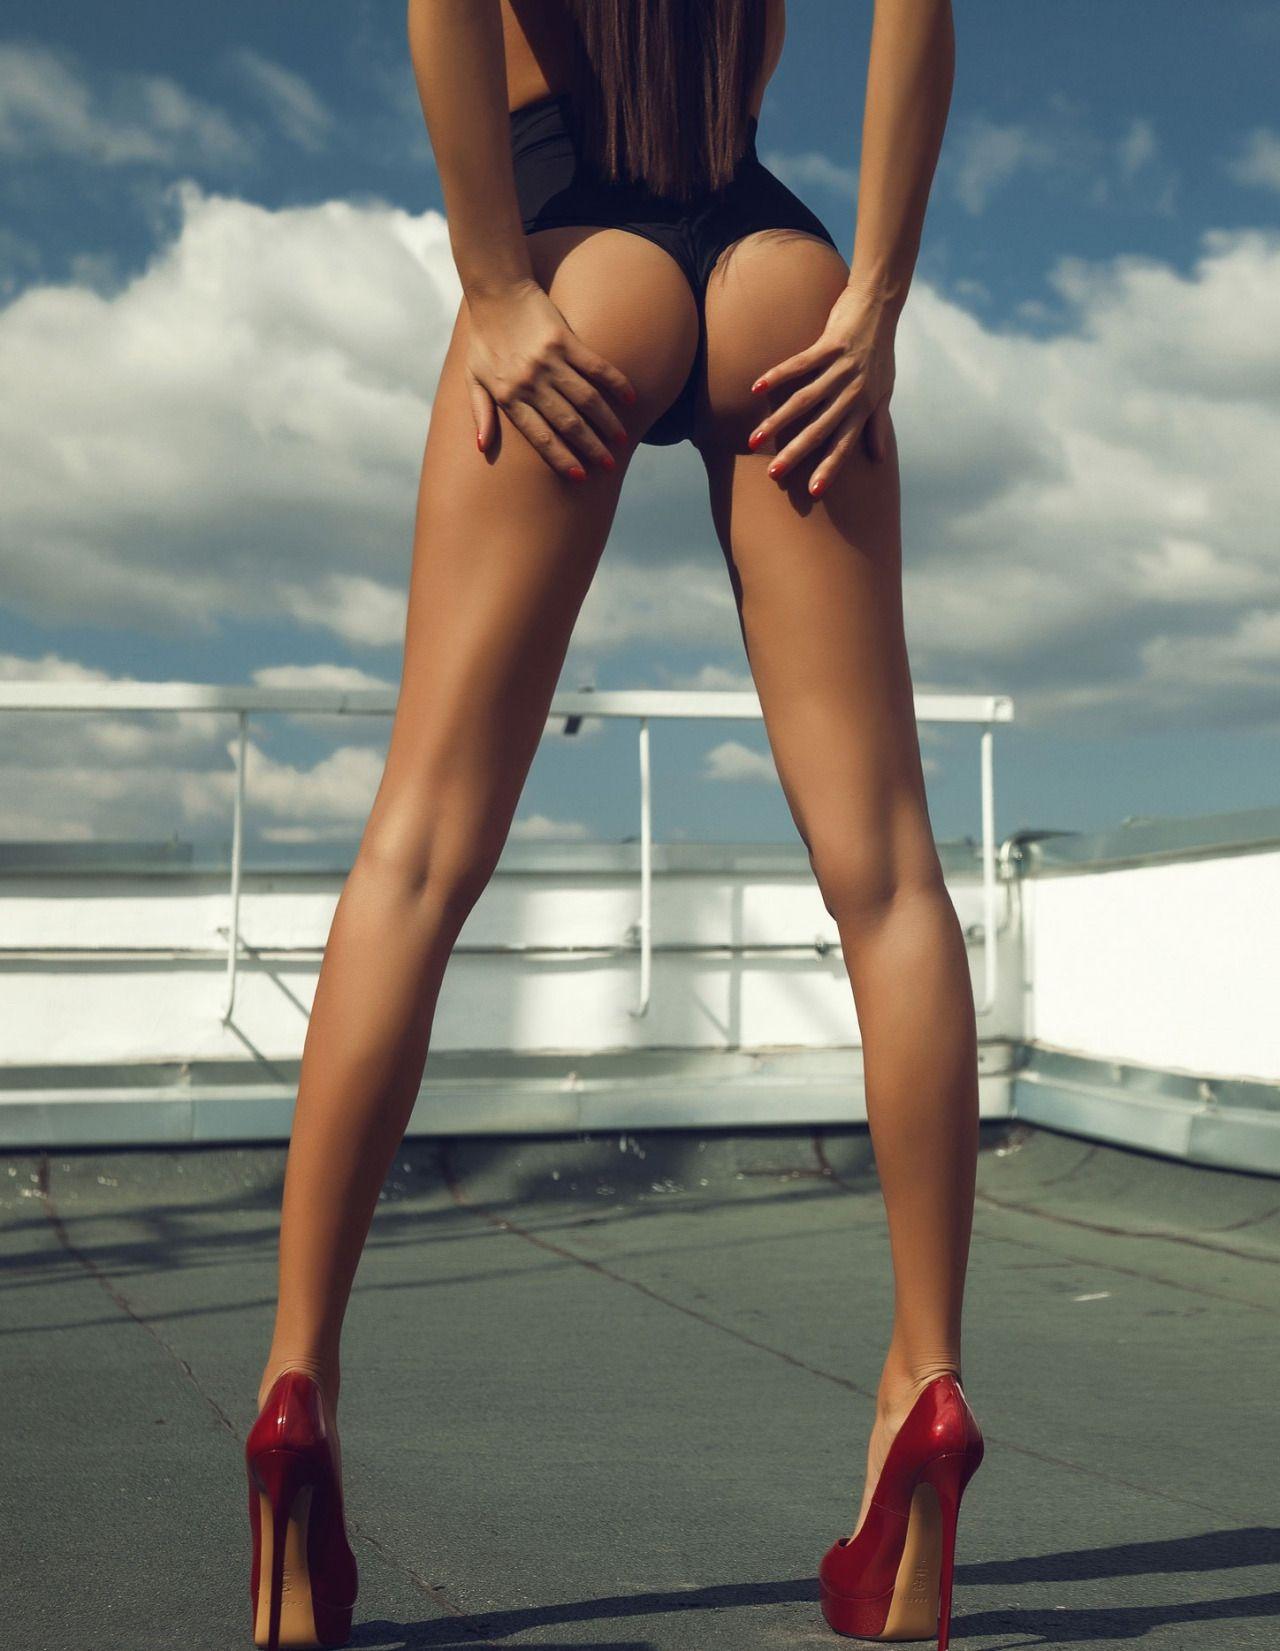 Cleavage Bilyana Evgenieva nude (95 photos), Ass, Cleavage, Selfie, panties 2018